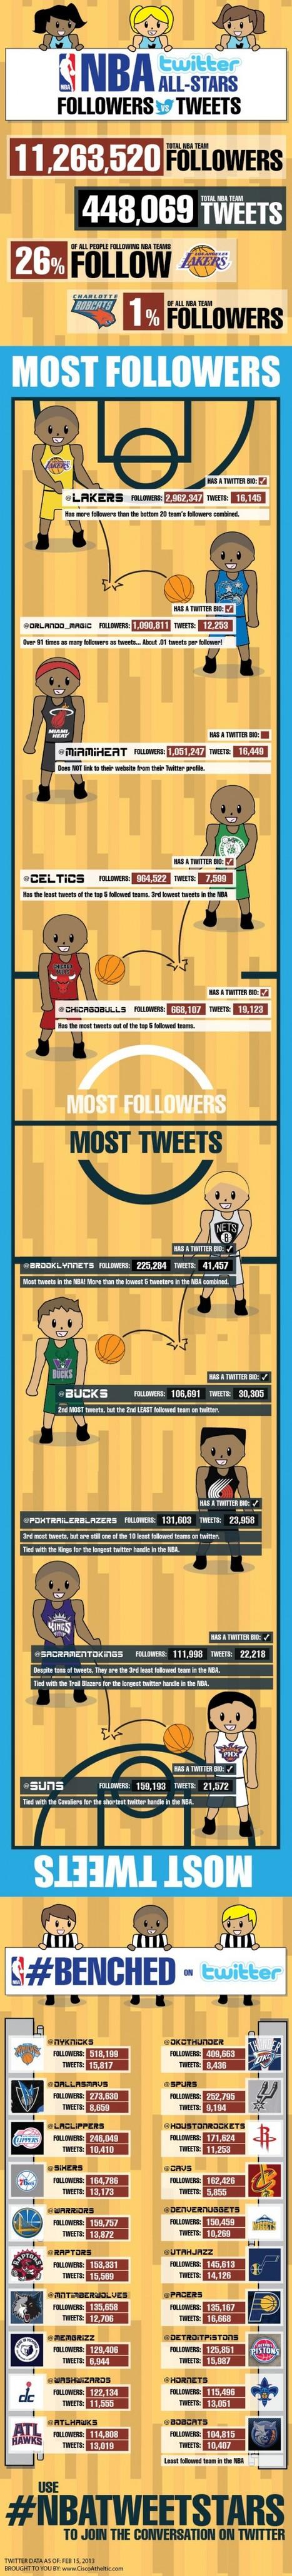 NBA Twitter All-Stars [INFOGRAPHIC] | Football | Scoop.it